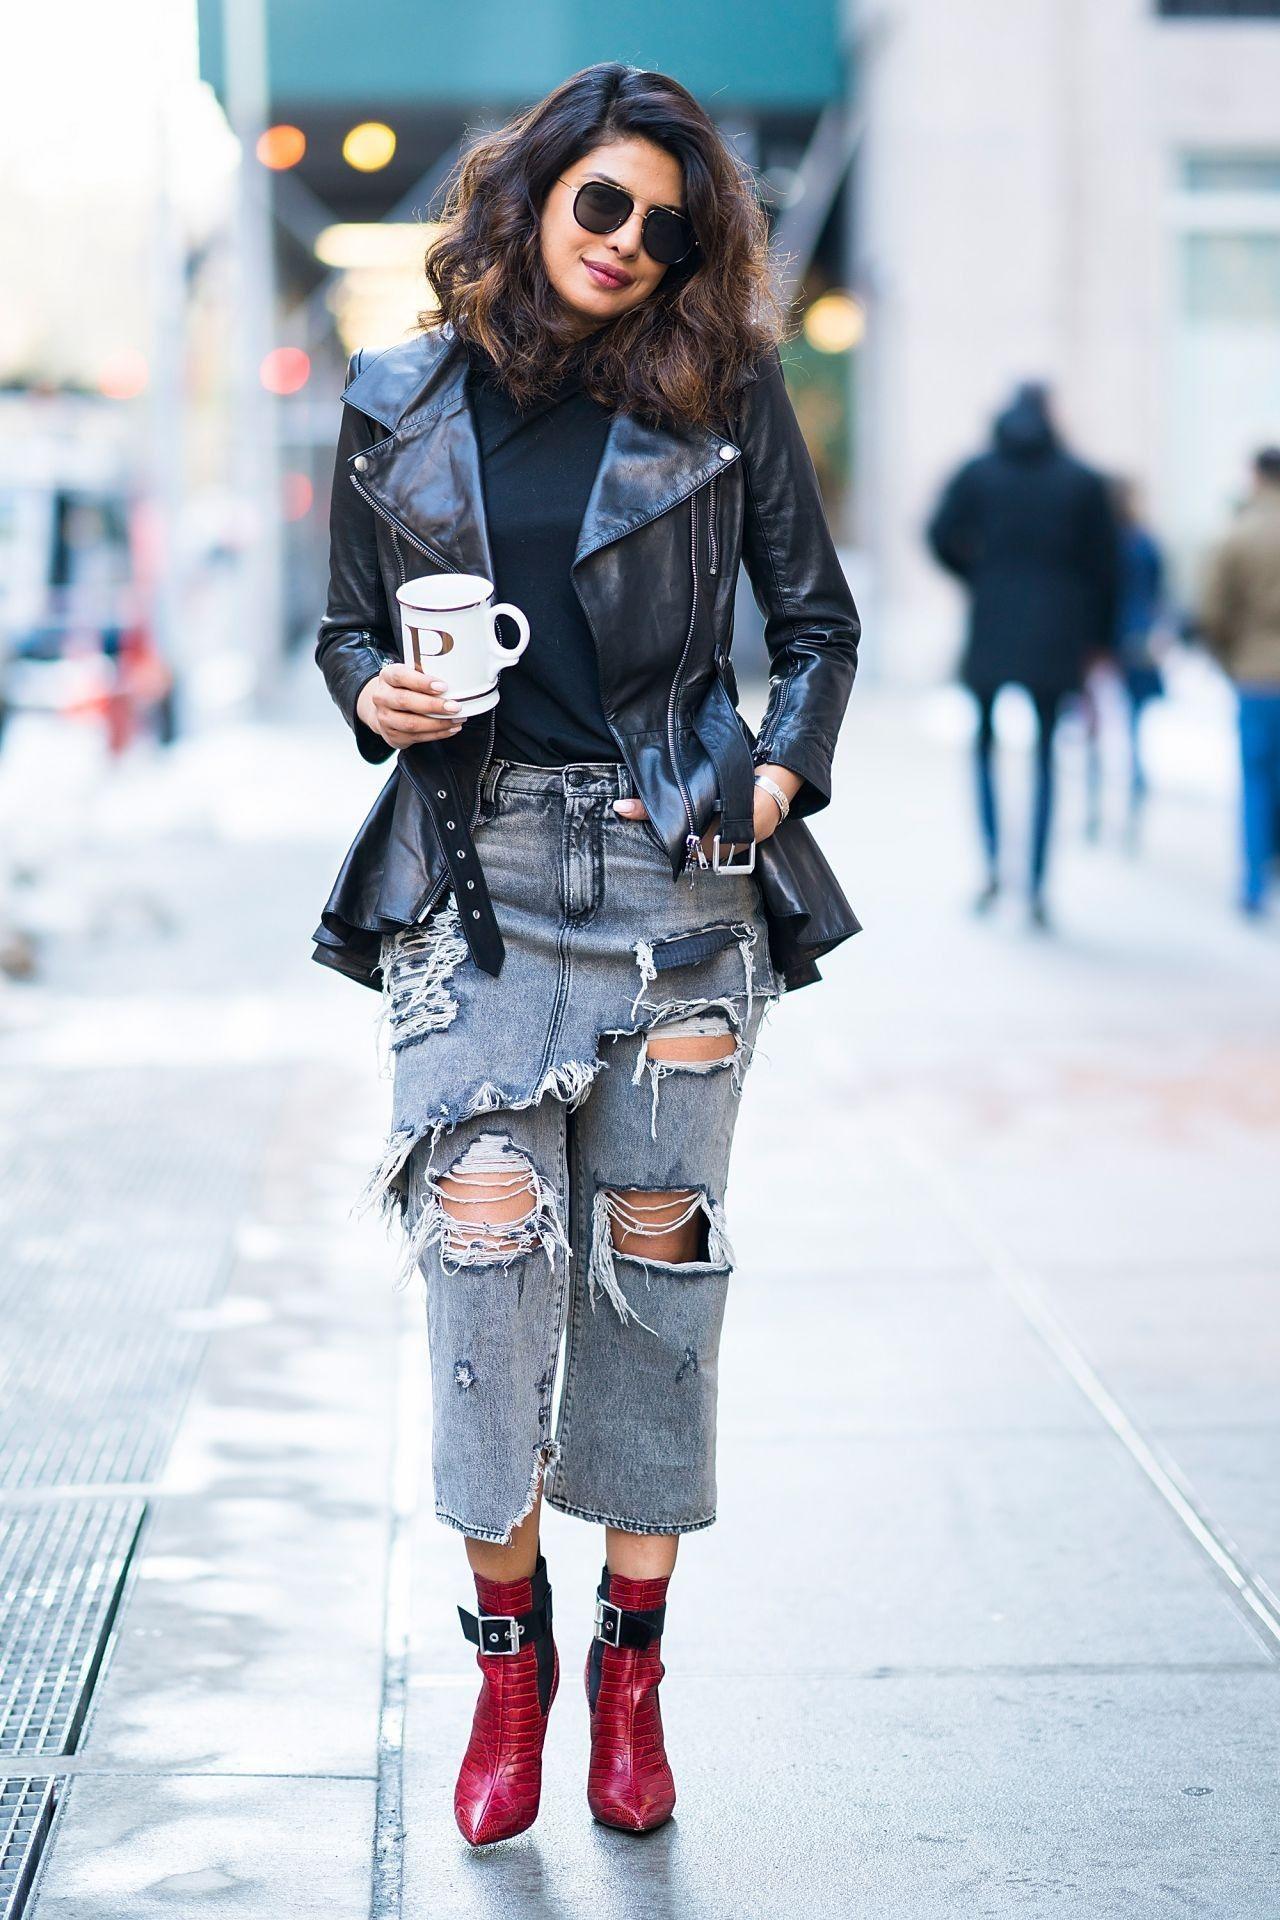 Priyanka Chopra Street Style in Tribecca January 9th 2018 wearing an  Alexander McQueen Leather Biker jacket, R13 double classic shredded hem  Jean, ... 0789e6f6dbe